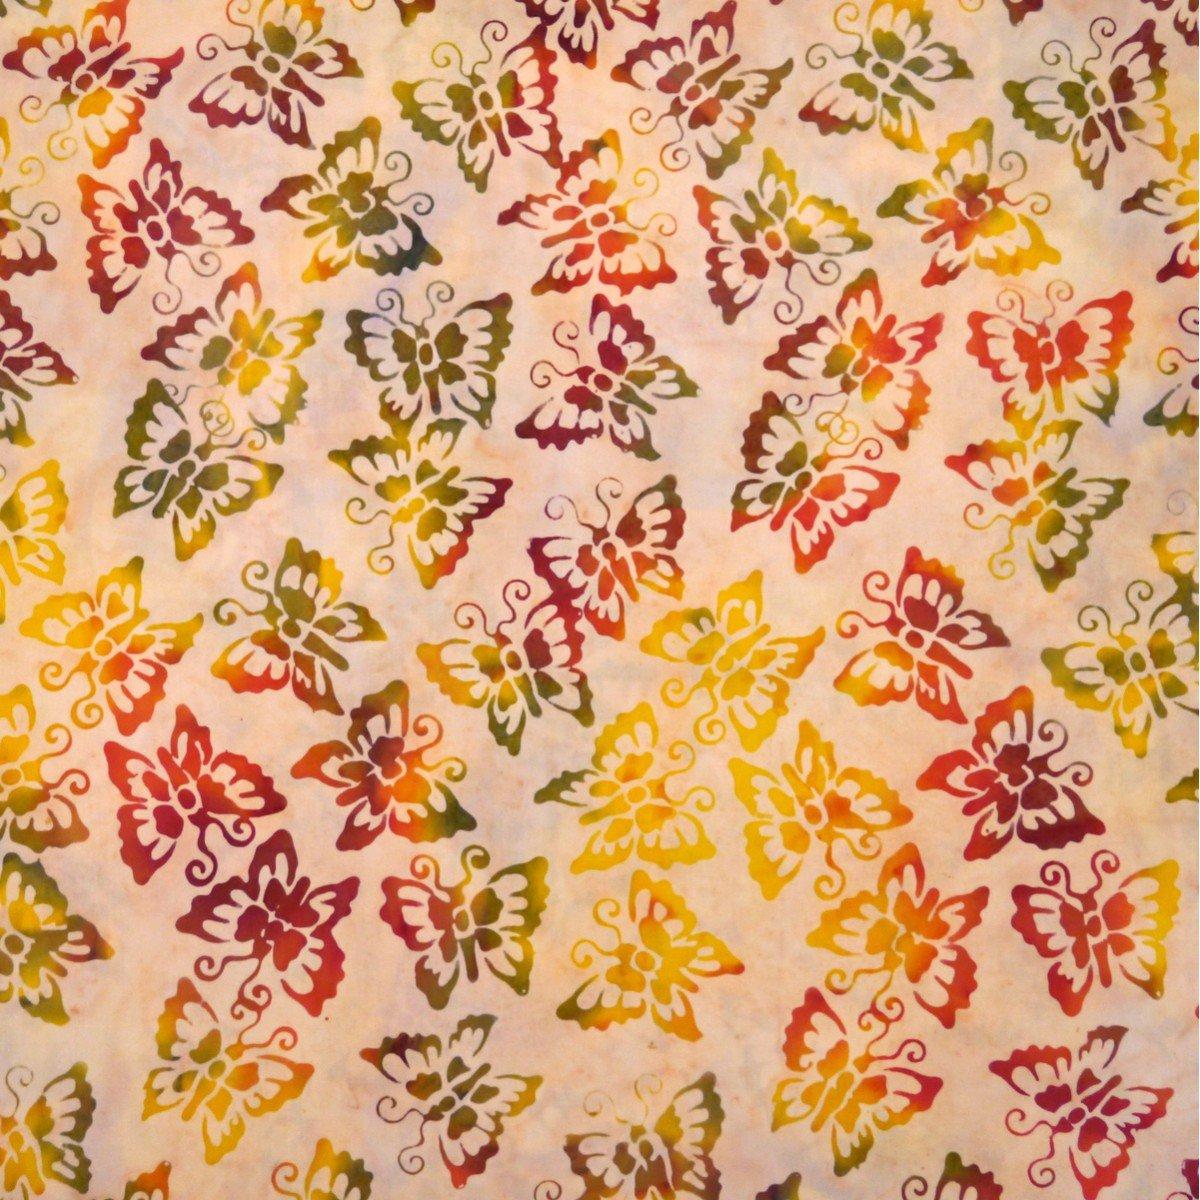 Batik by Mirah - Maple Maze Butterflies